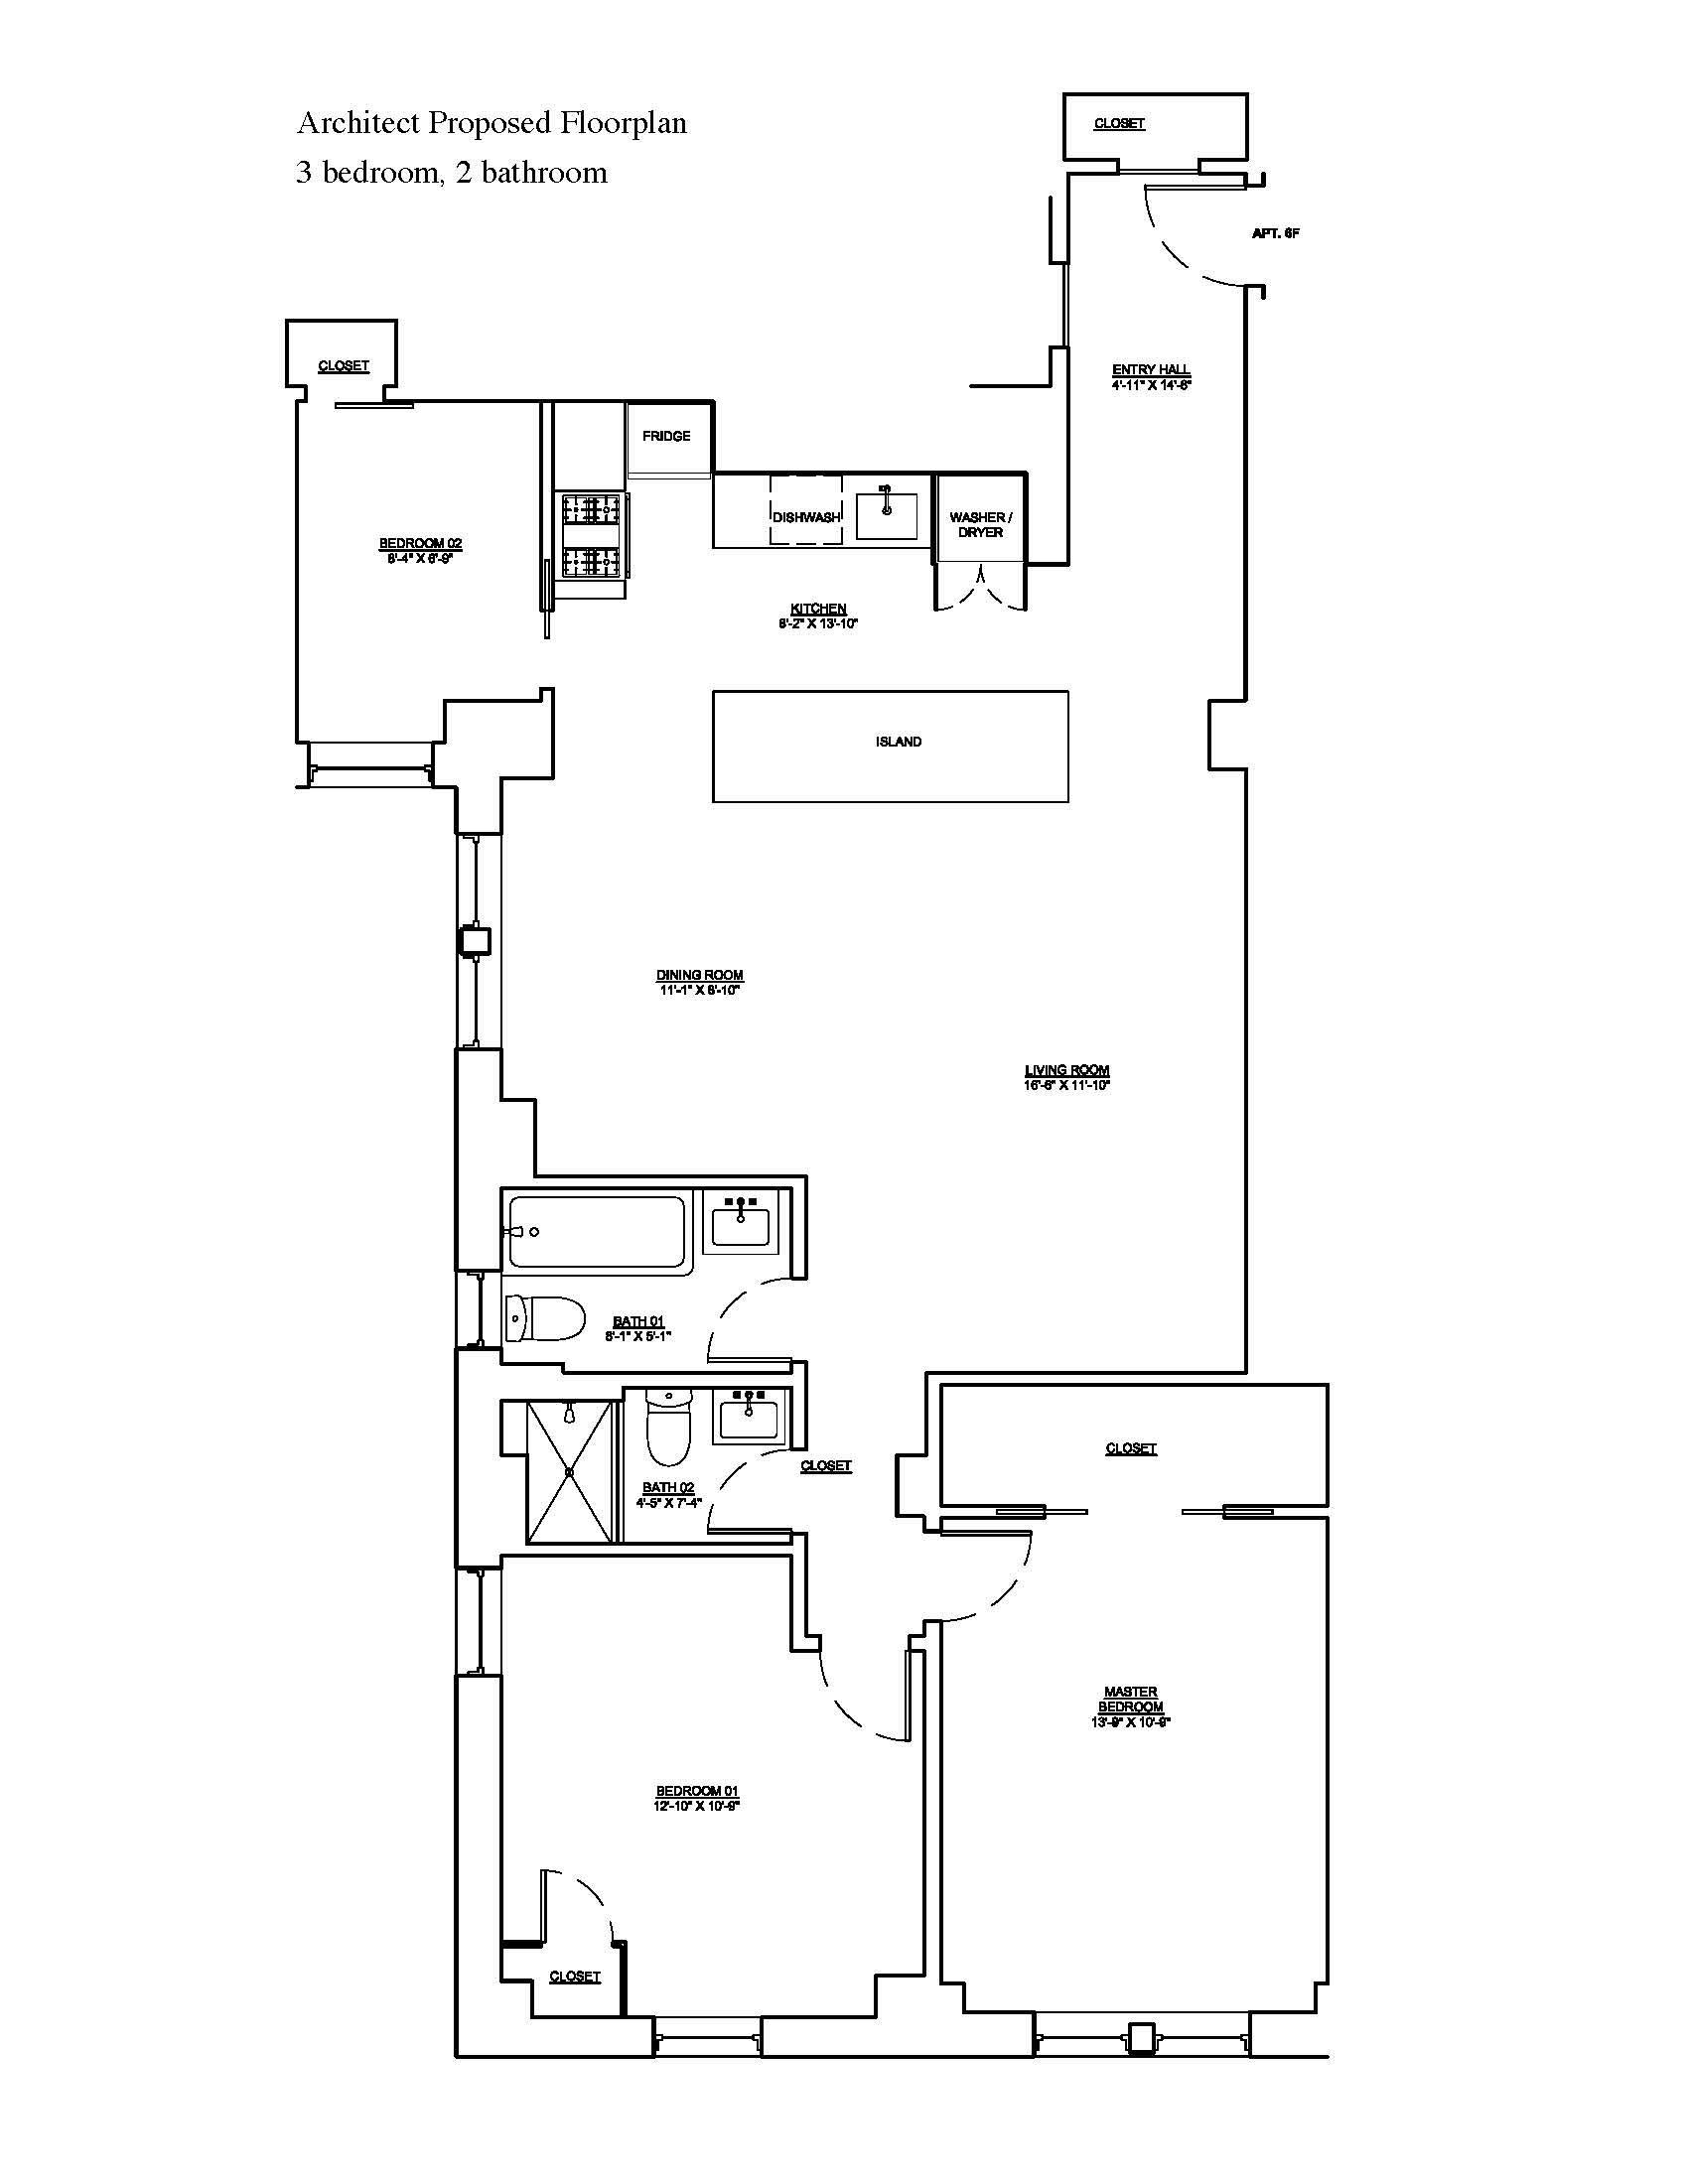 83364084floorplan architect new